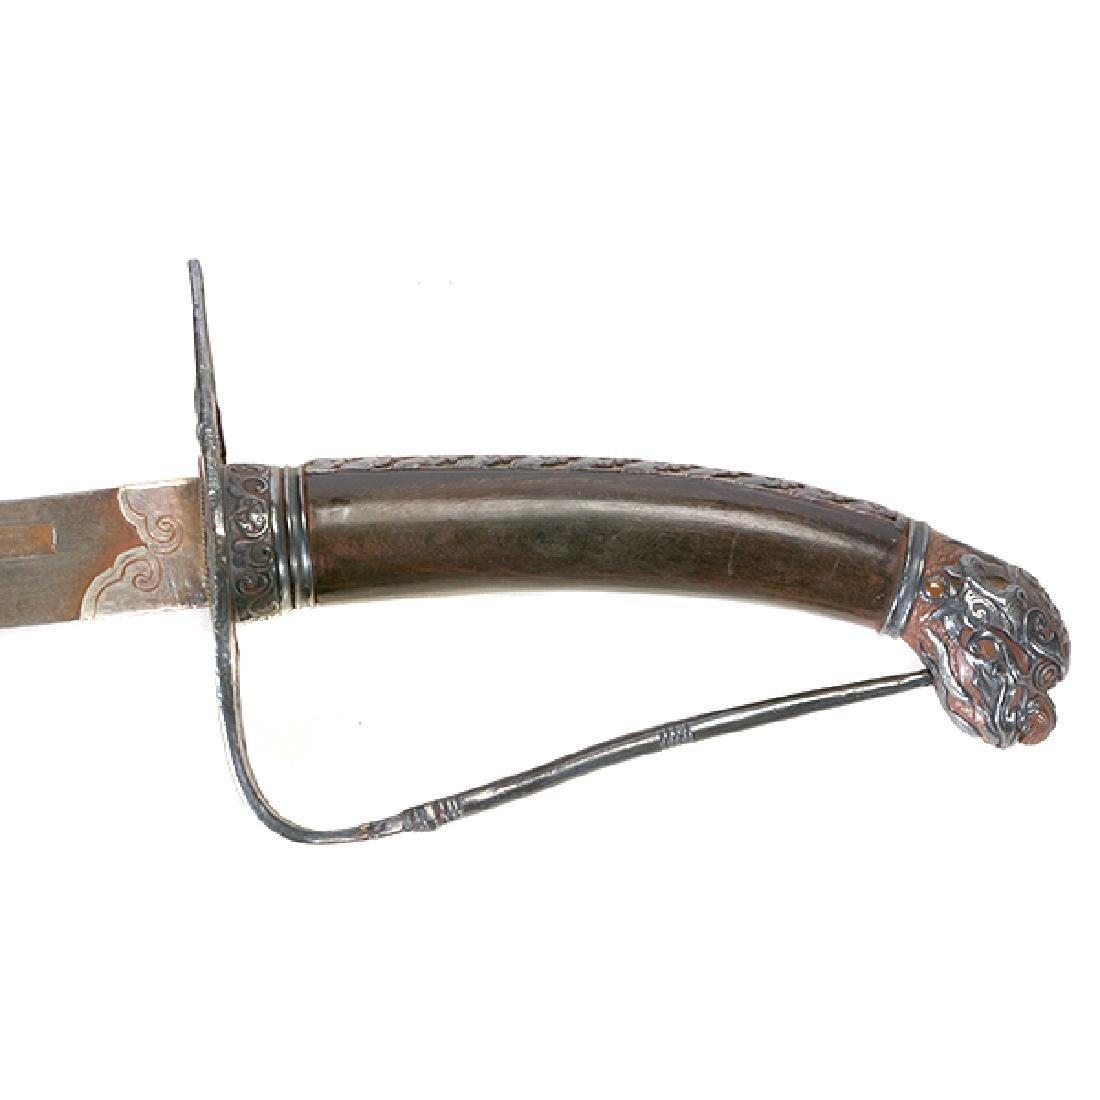 A Tibetan Ceremonial Sword, 19th Century - 2